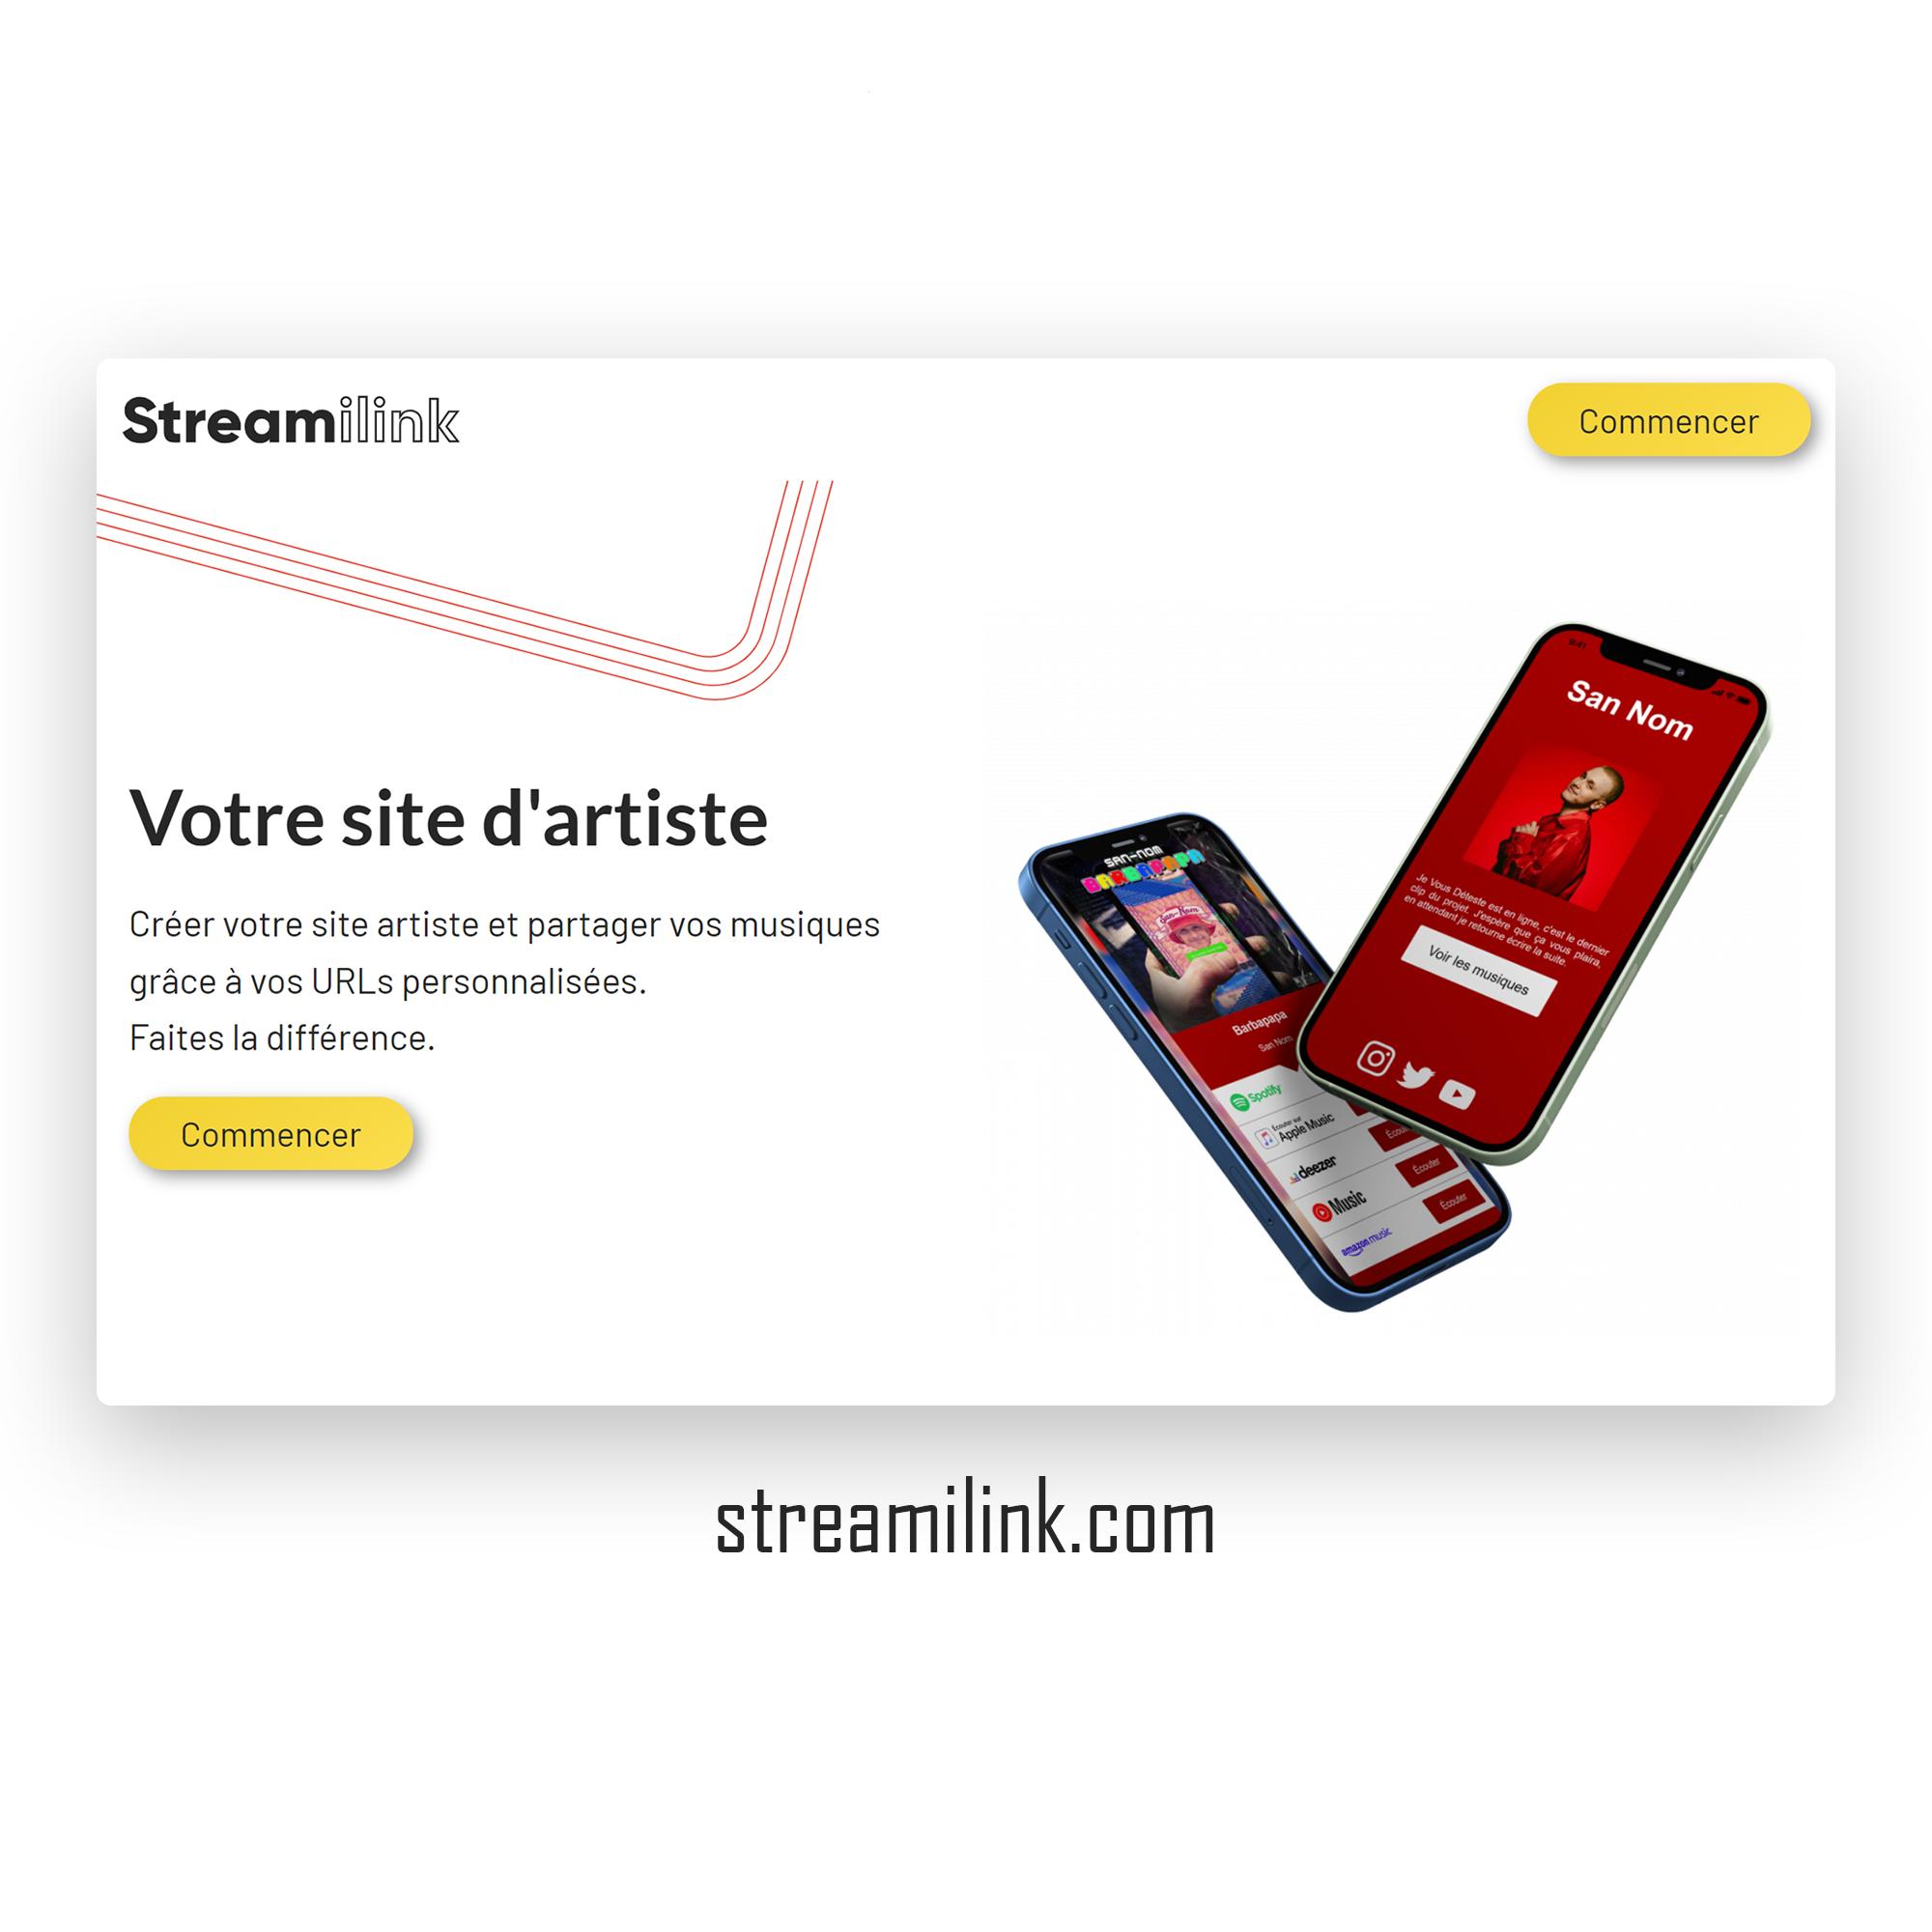 Streamilink